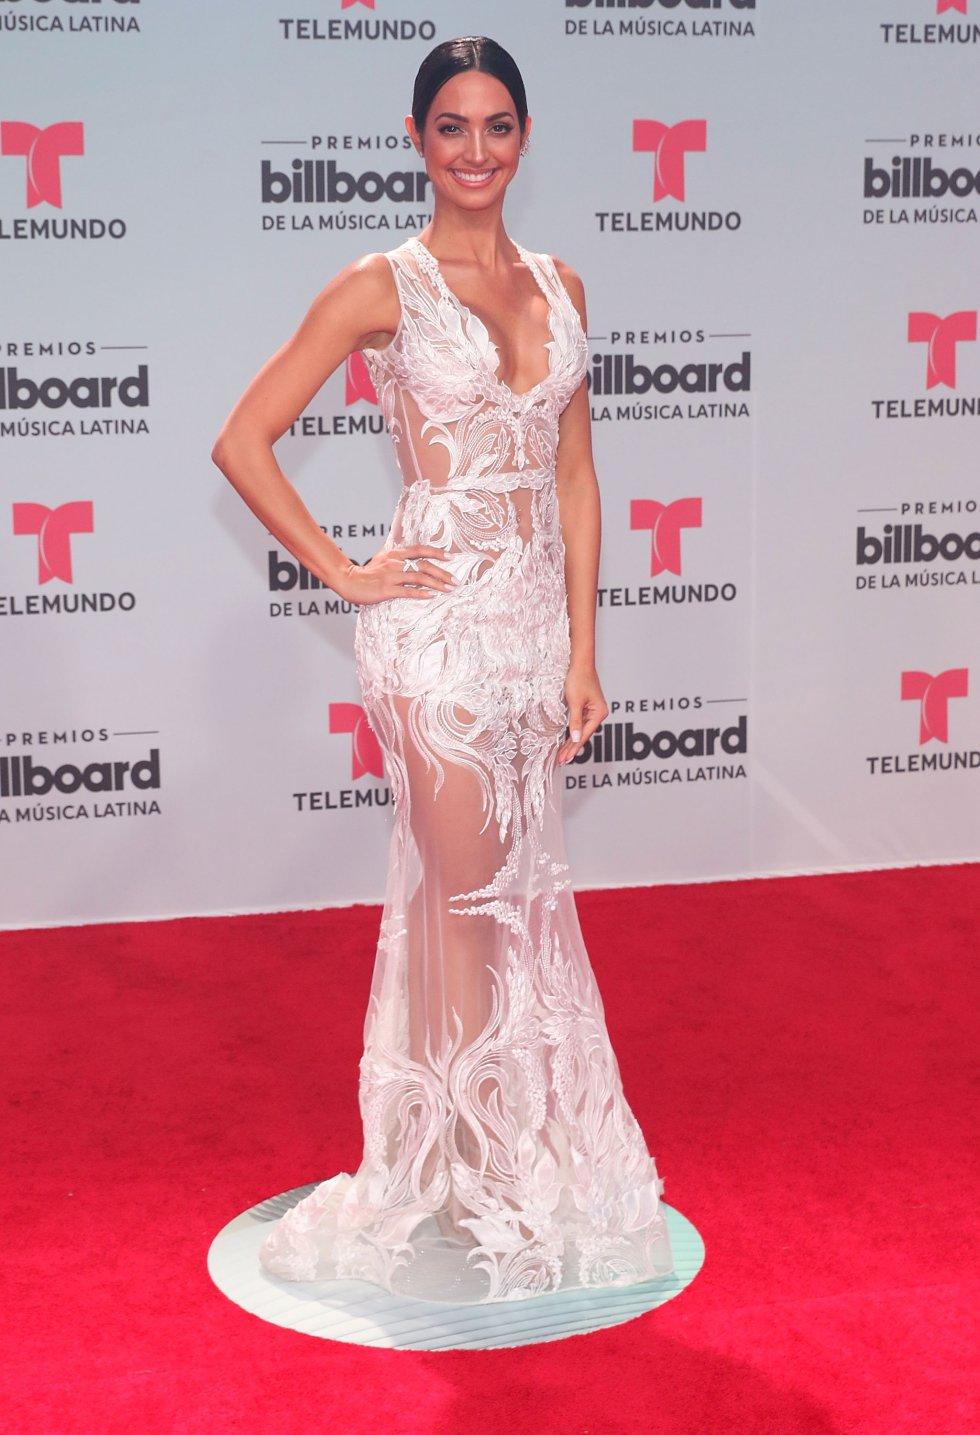 Erika Csiszer, presentadora, reportera, modelo y actriz venezolana.